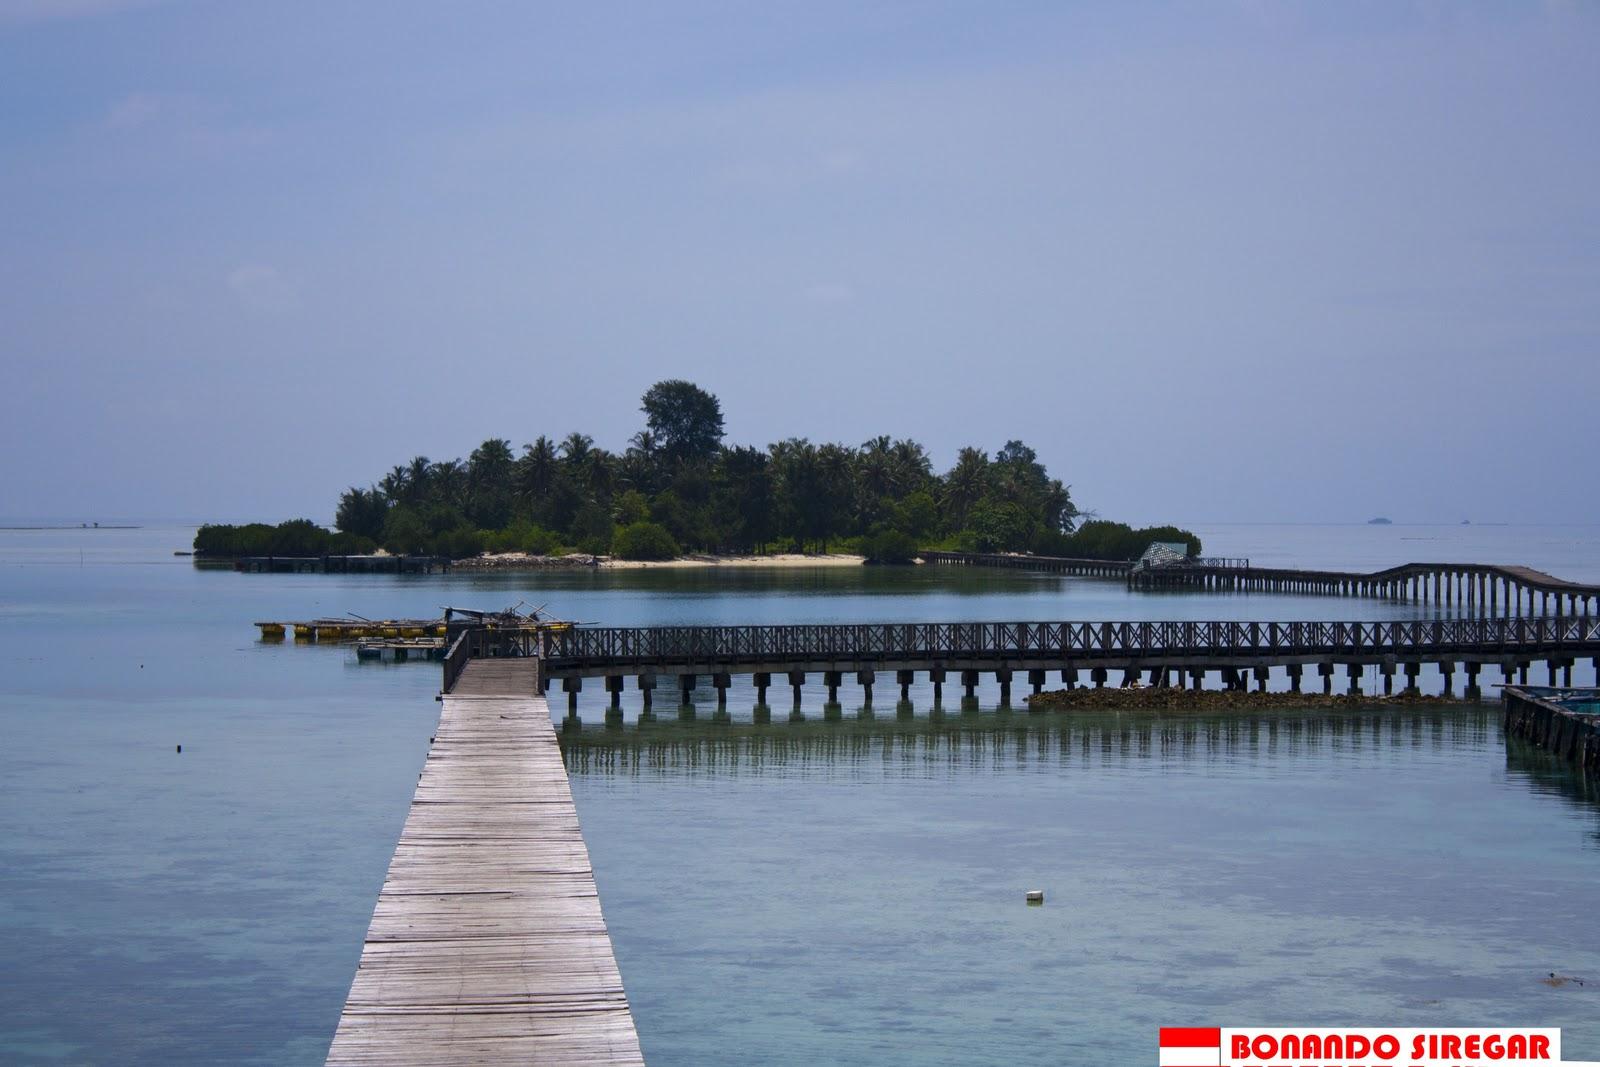 backpacking ke pulau tidung jelajah indonesiaku rh marijelajahindonesiaku com